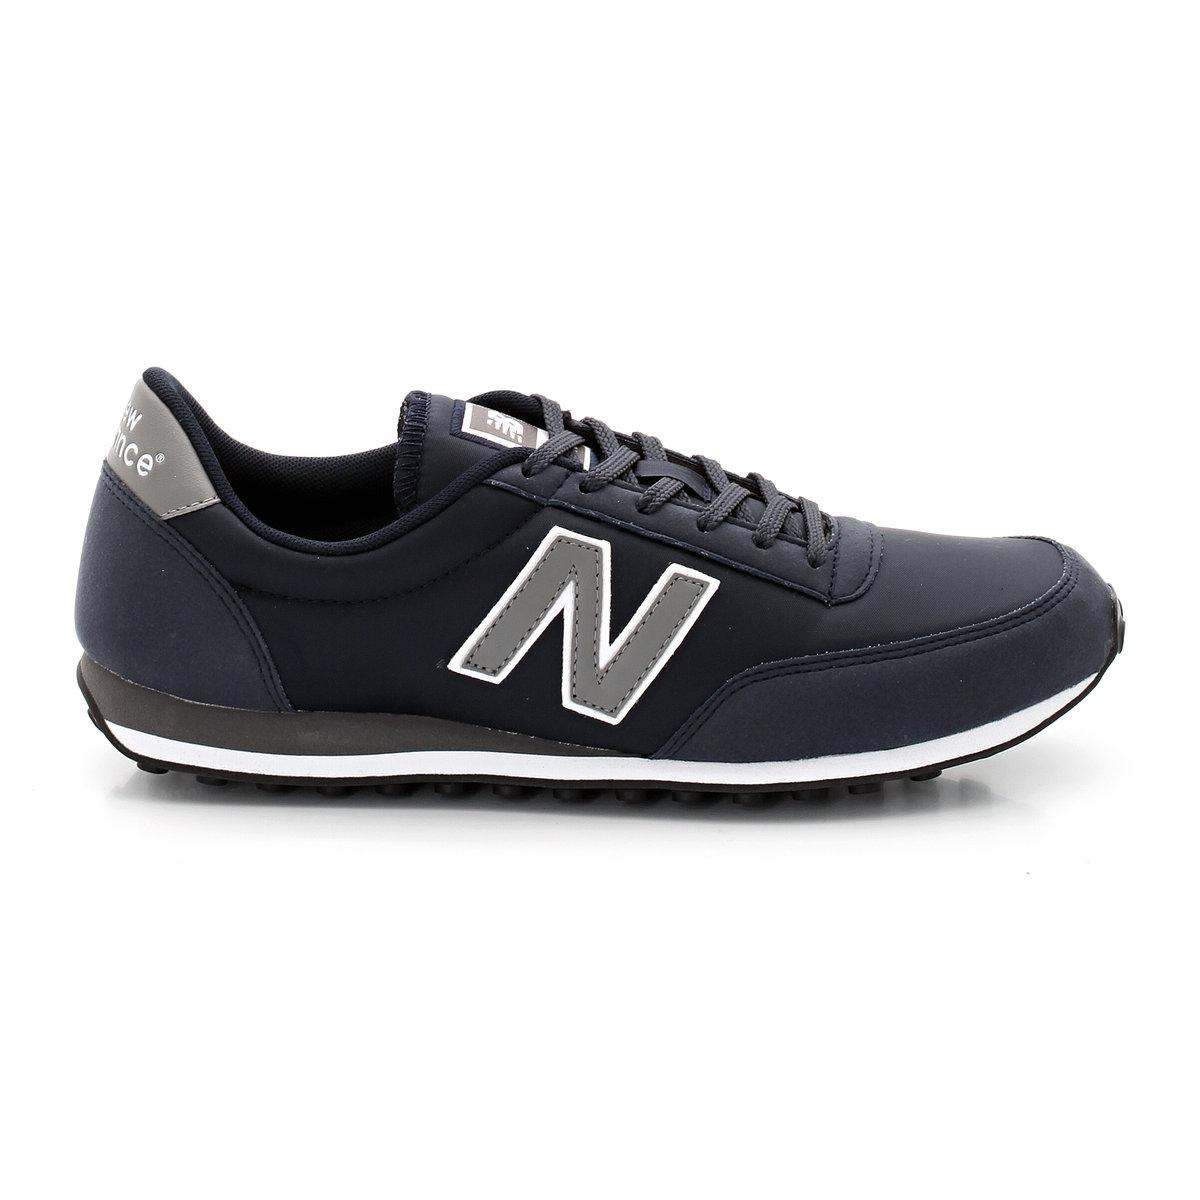 Кроссовки низкие NEW BALANCE U410CBНизкие кросовки NEW BALANCE U410CB Подкладка: текстиль Подошва: синтетика. Стелька: текстиль Верх: микрофибра + нейлон Застёжка: шнуровка<br><br>Цвет: темно-синий